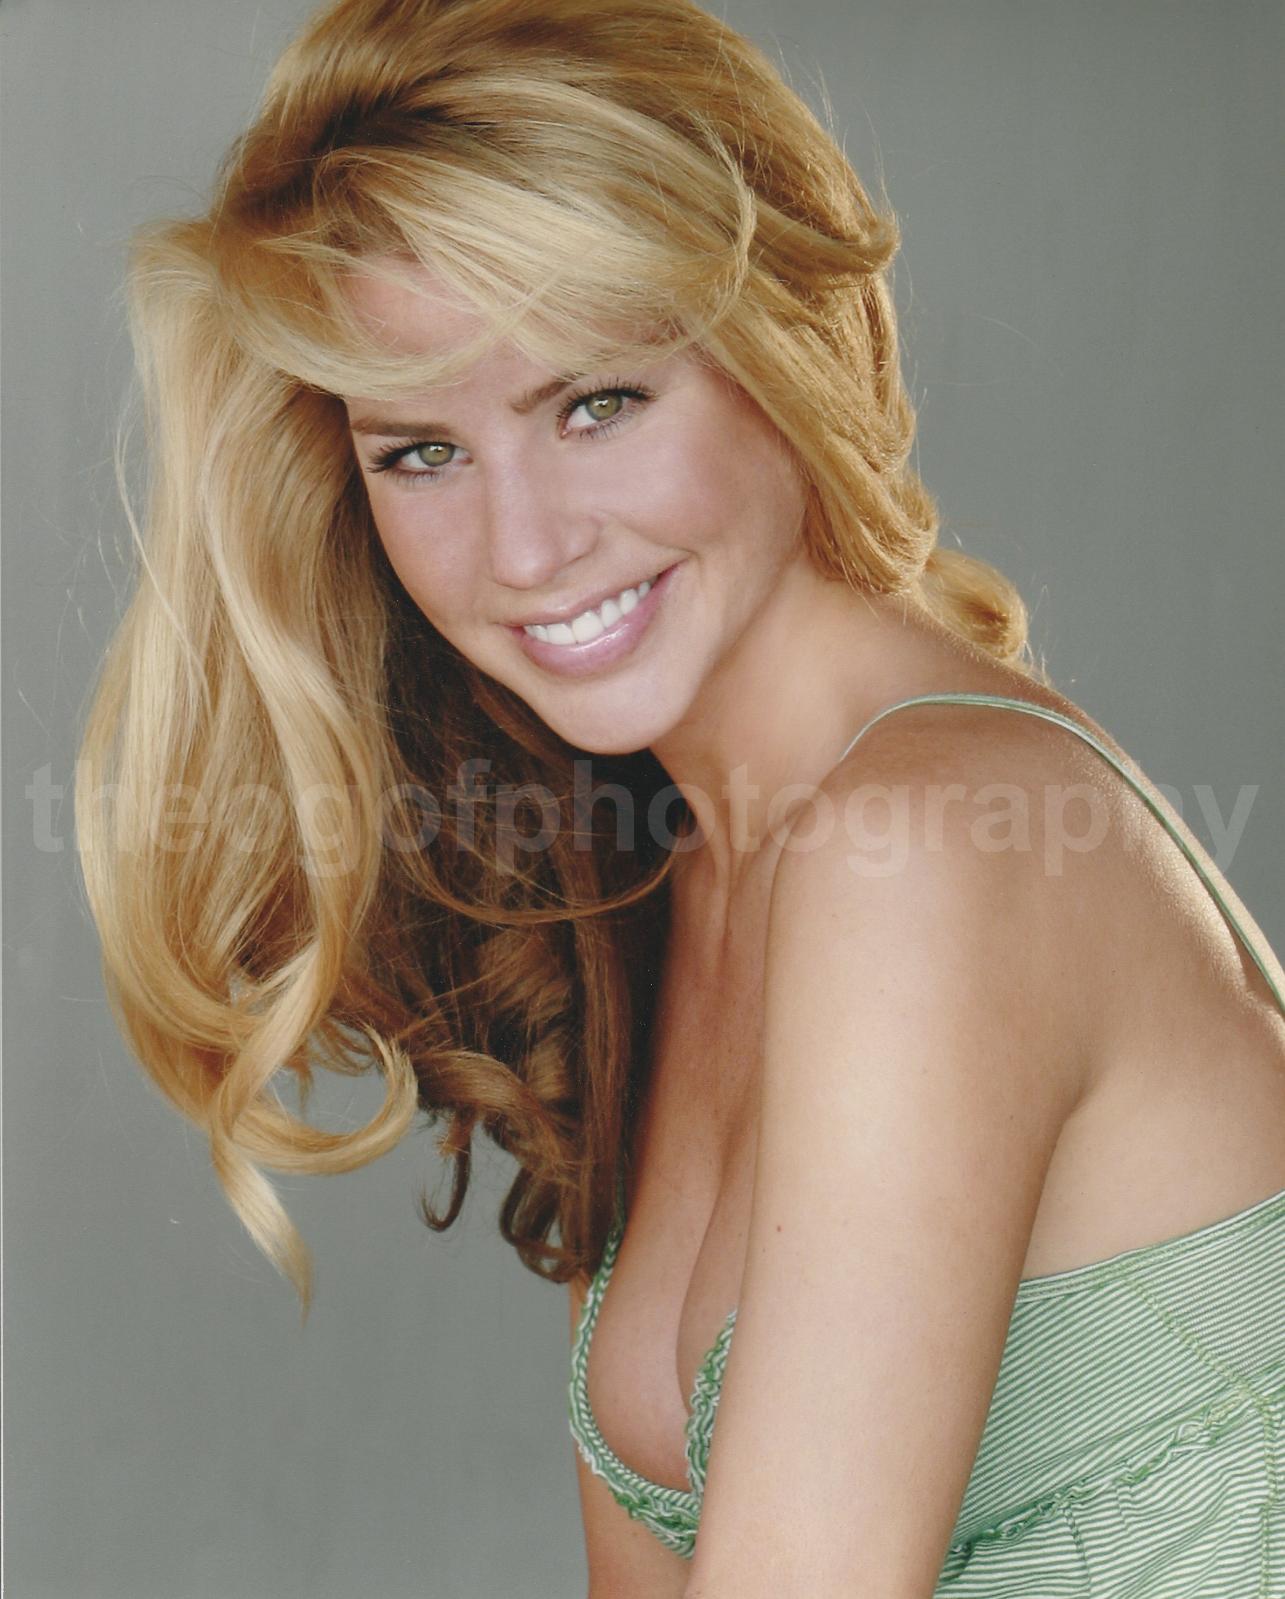 Beautiful Girl Blonde Green Eyes Found Photo 8x10 Free Shipping